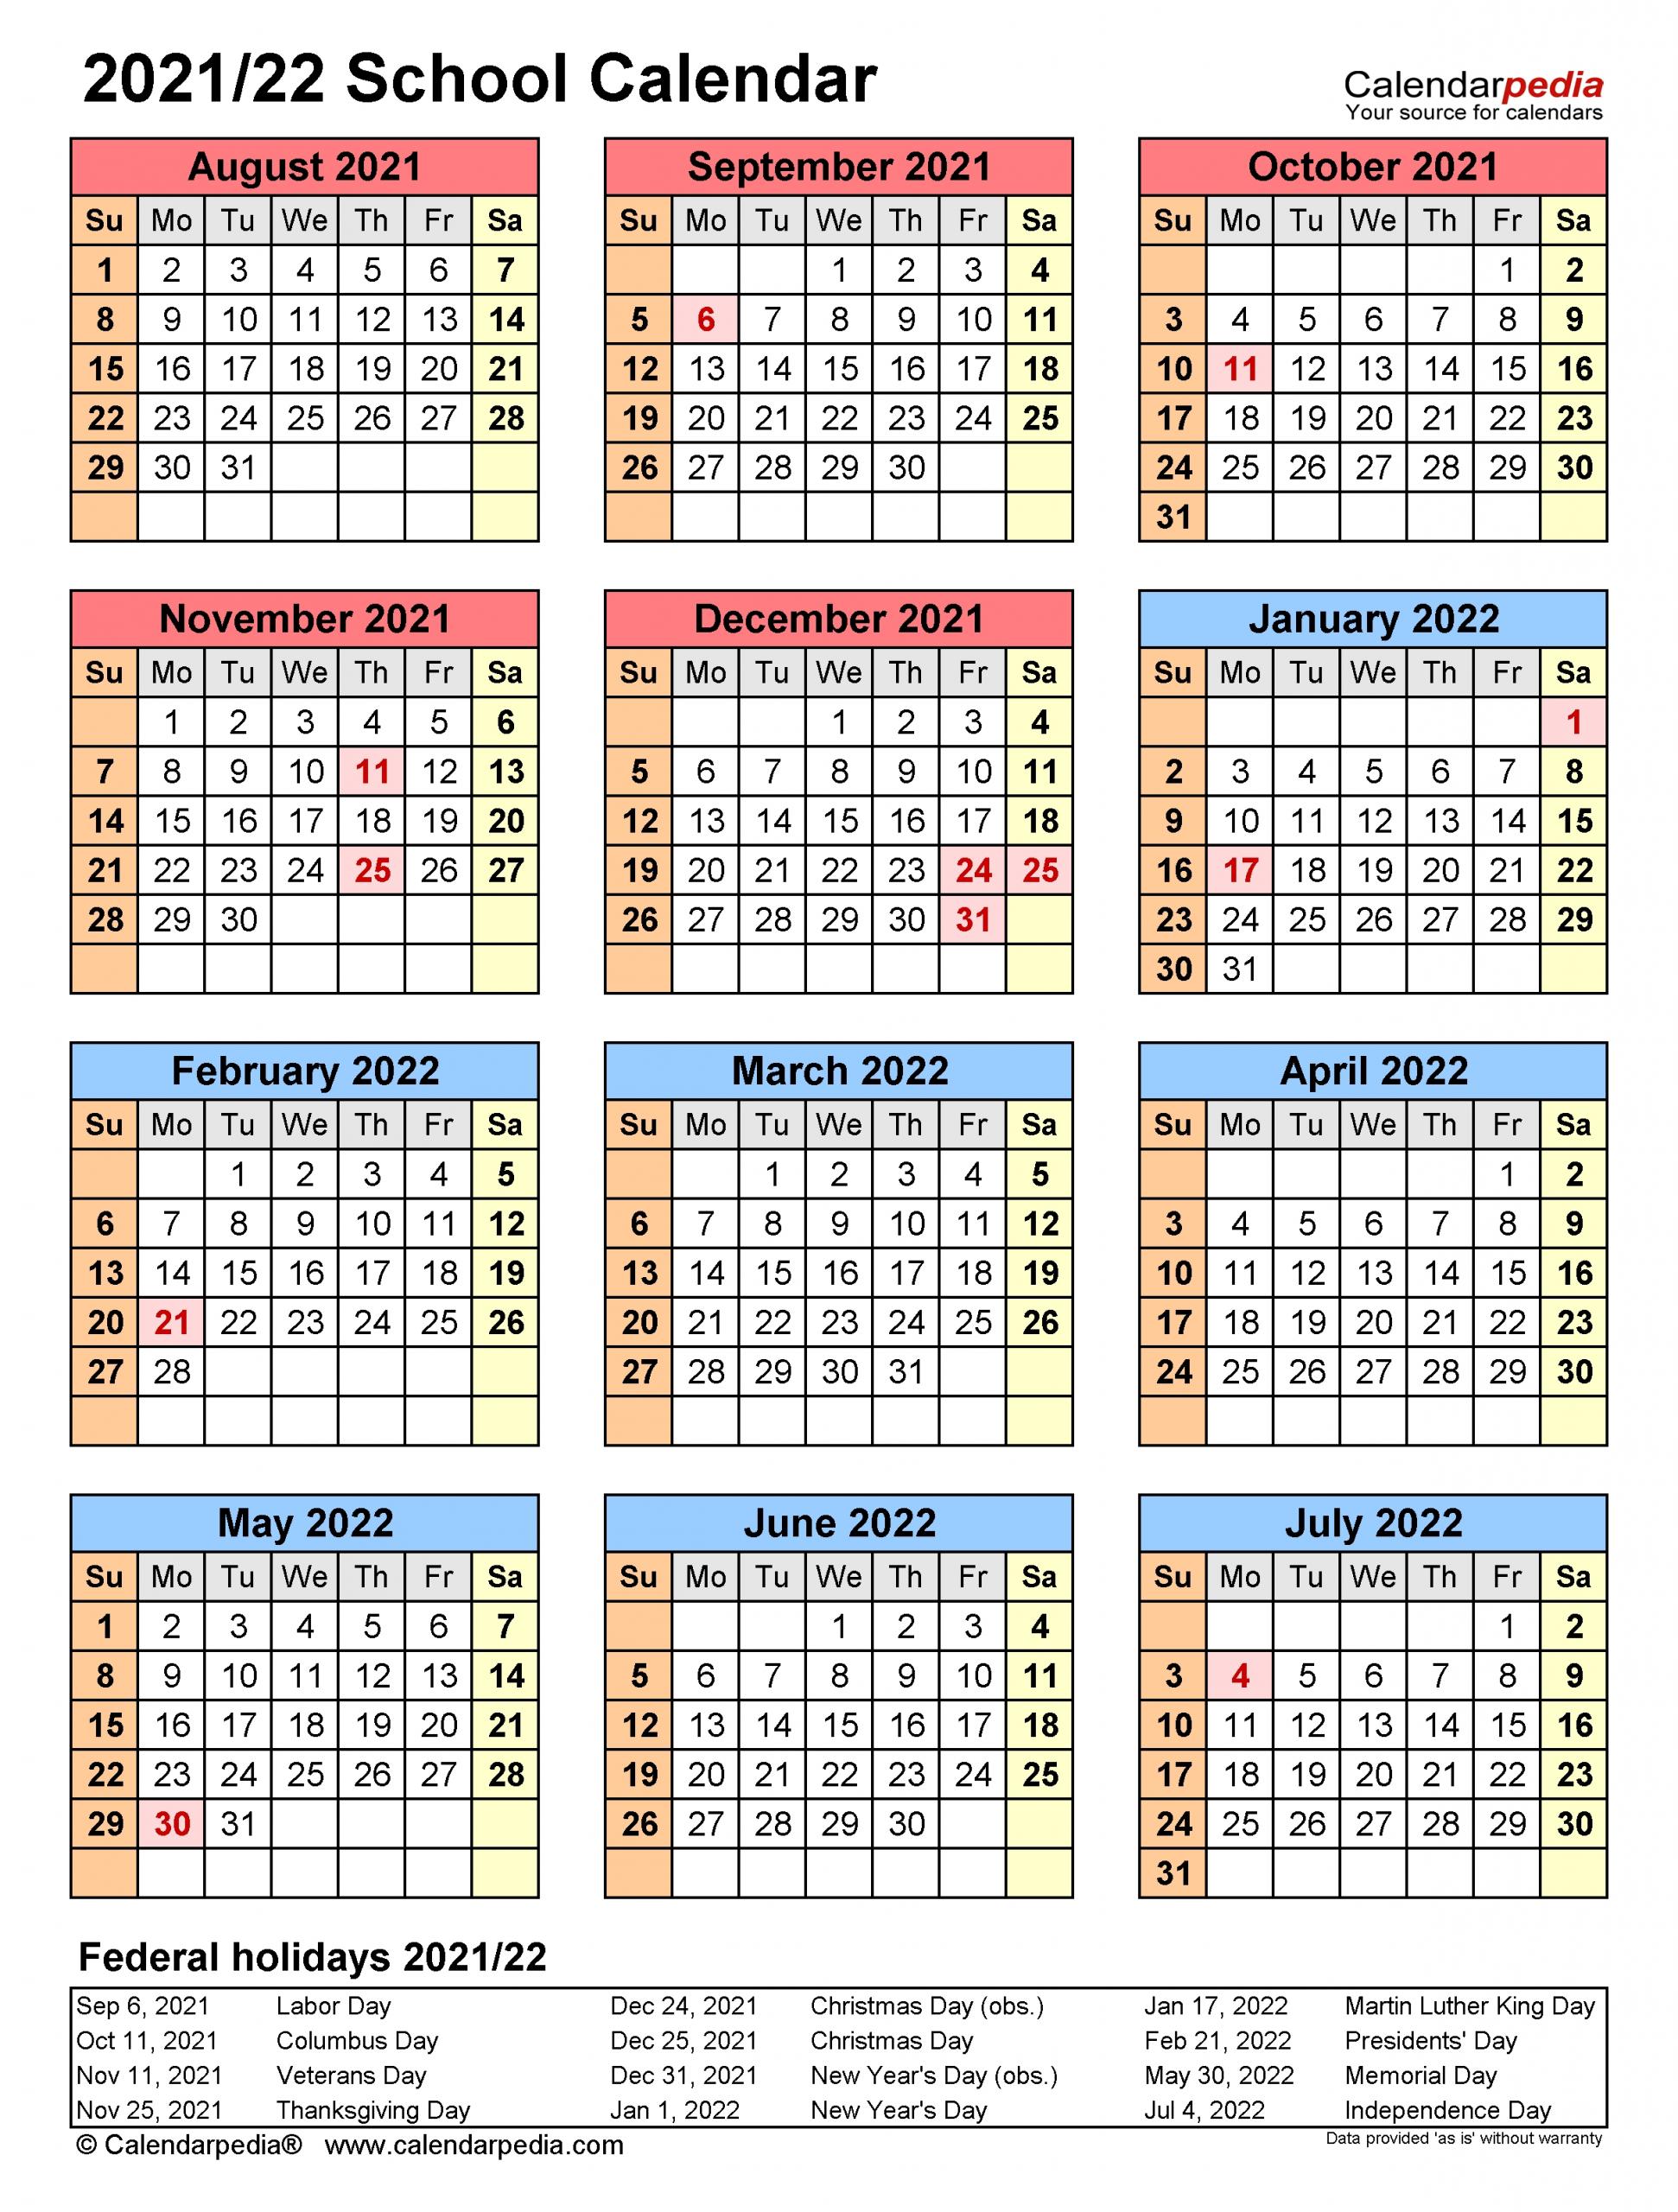 Fall 2022 Academic Calendar.Printable 2021 2022 School Calendar In 2021 School Calendar Calendar Template Calendar